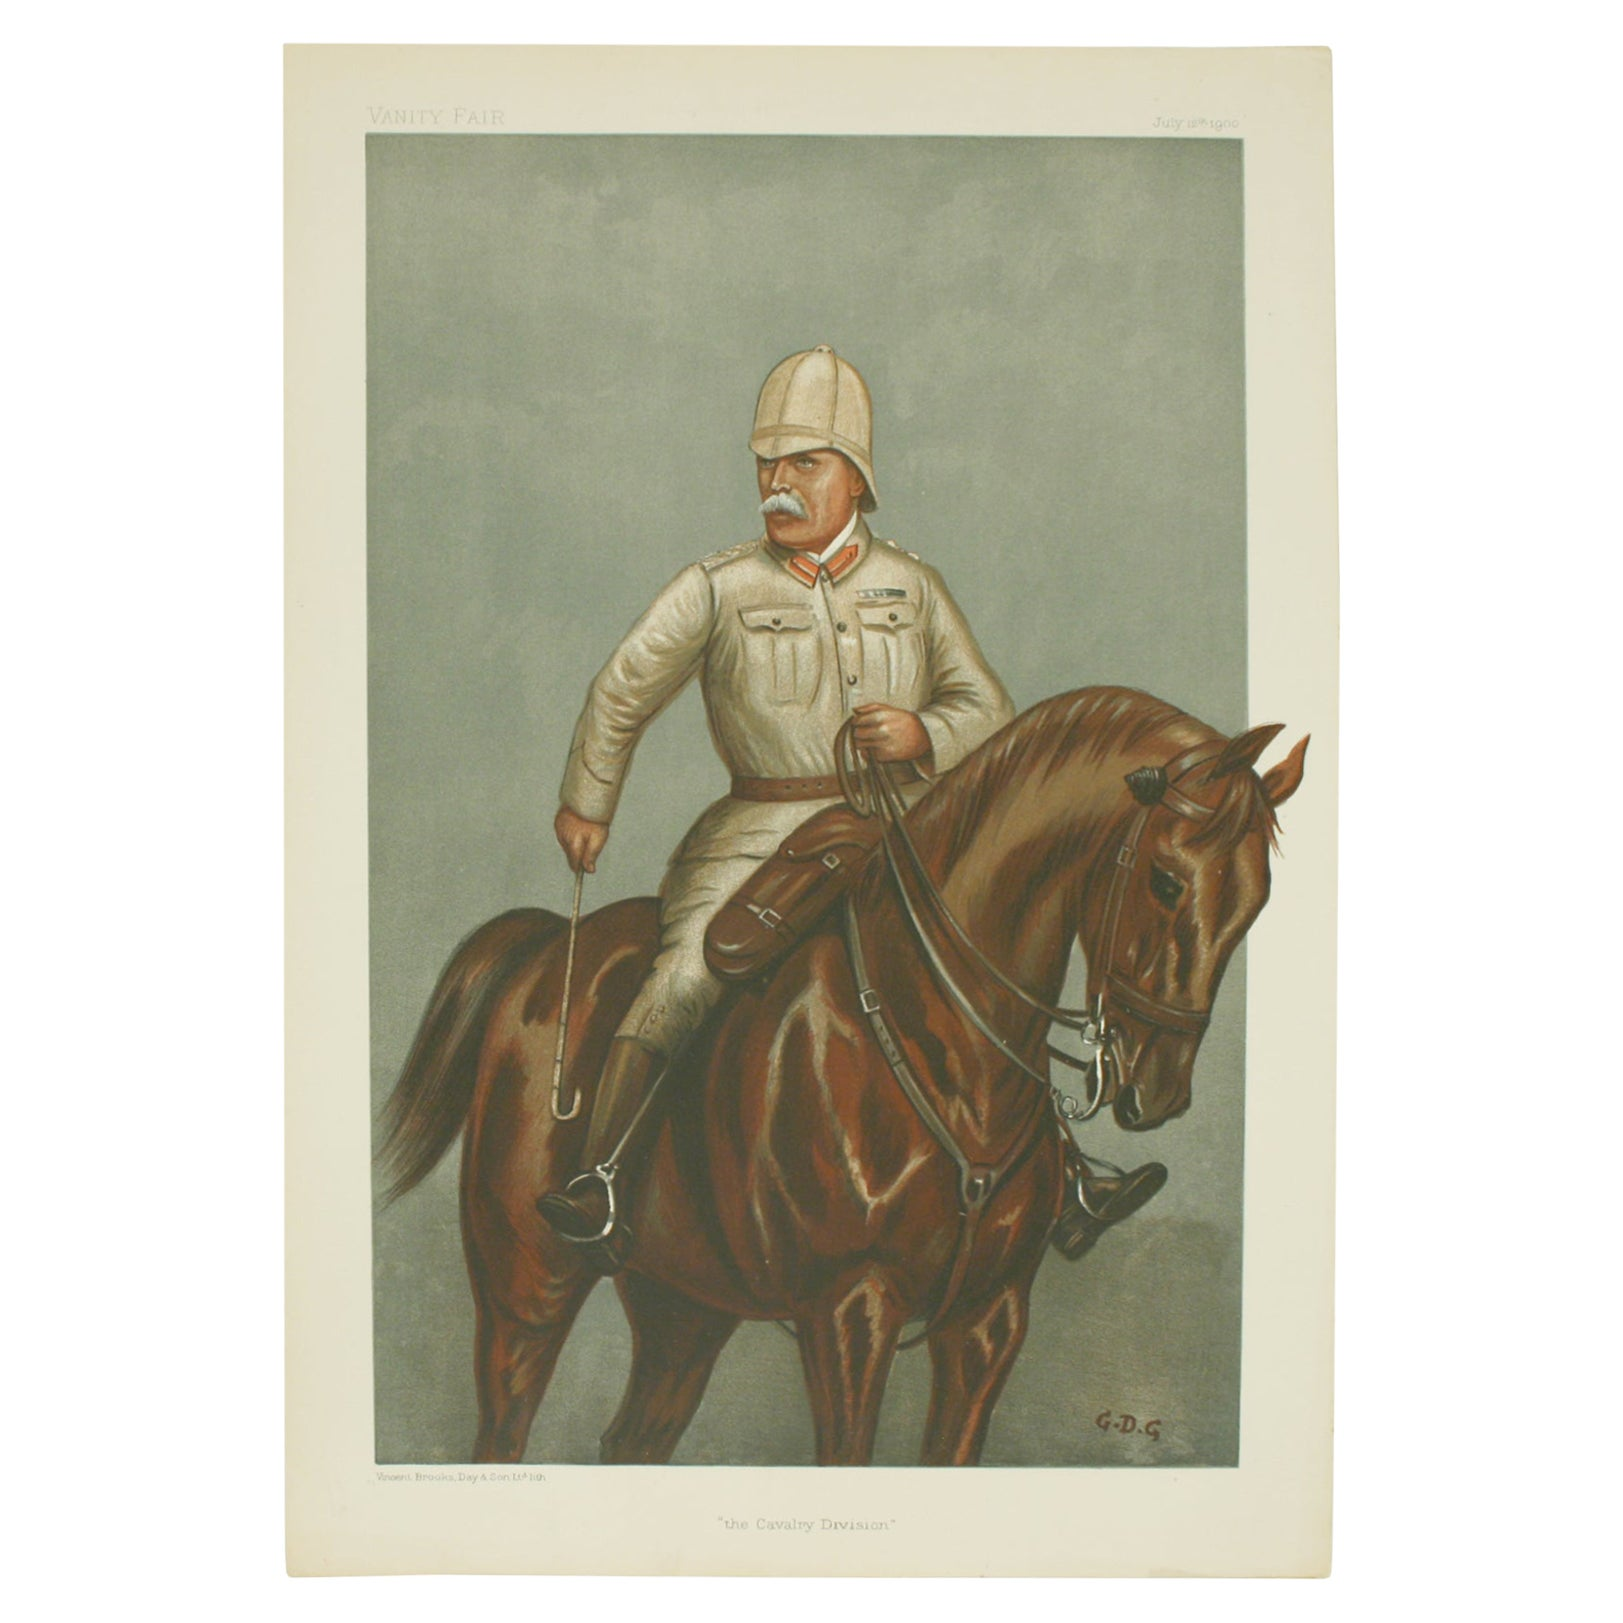 Vanity Fair, Military Print, the Cavalry Division